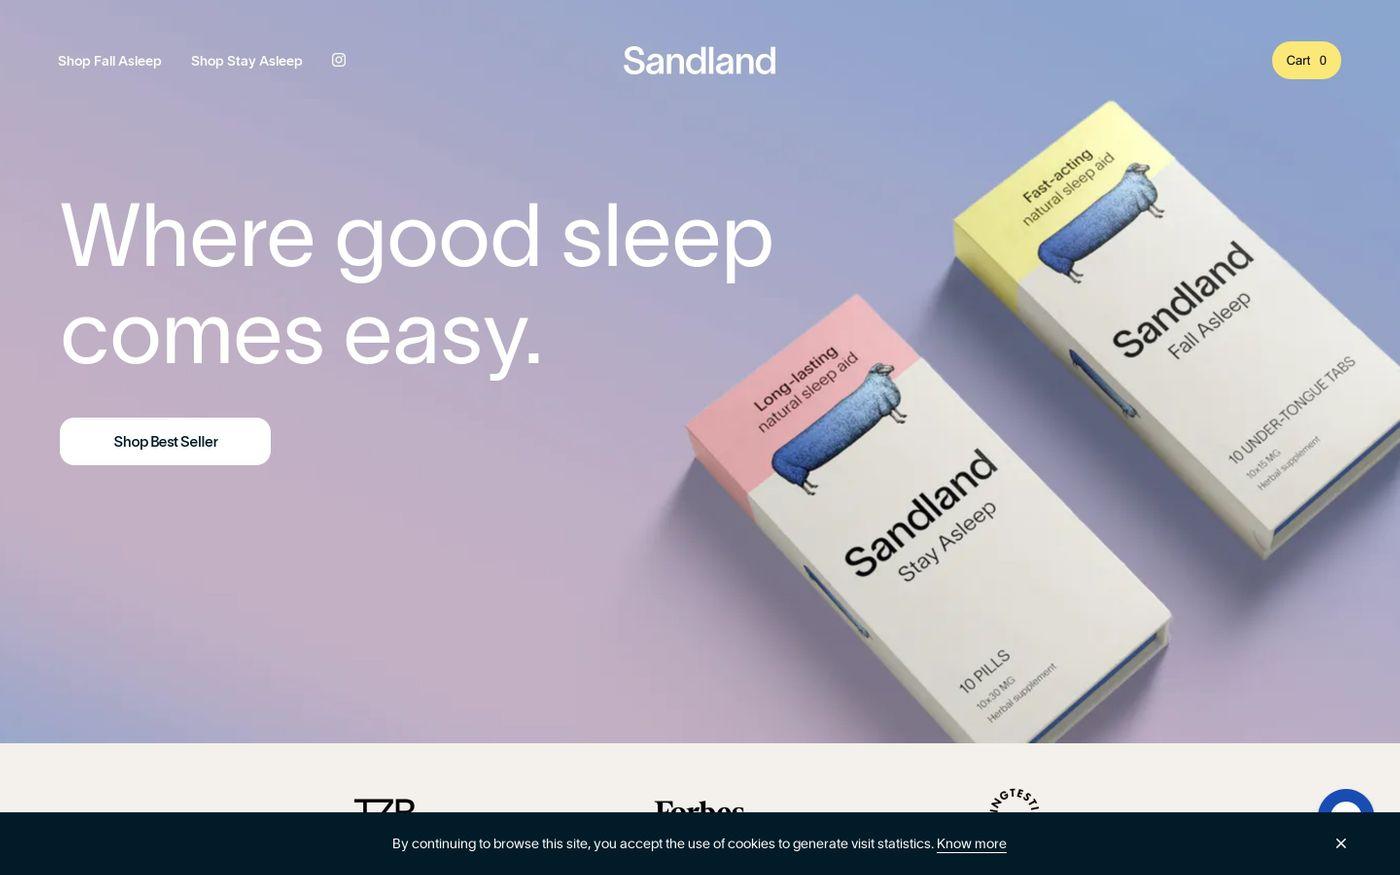 Screenshot of Sandland website